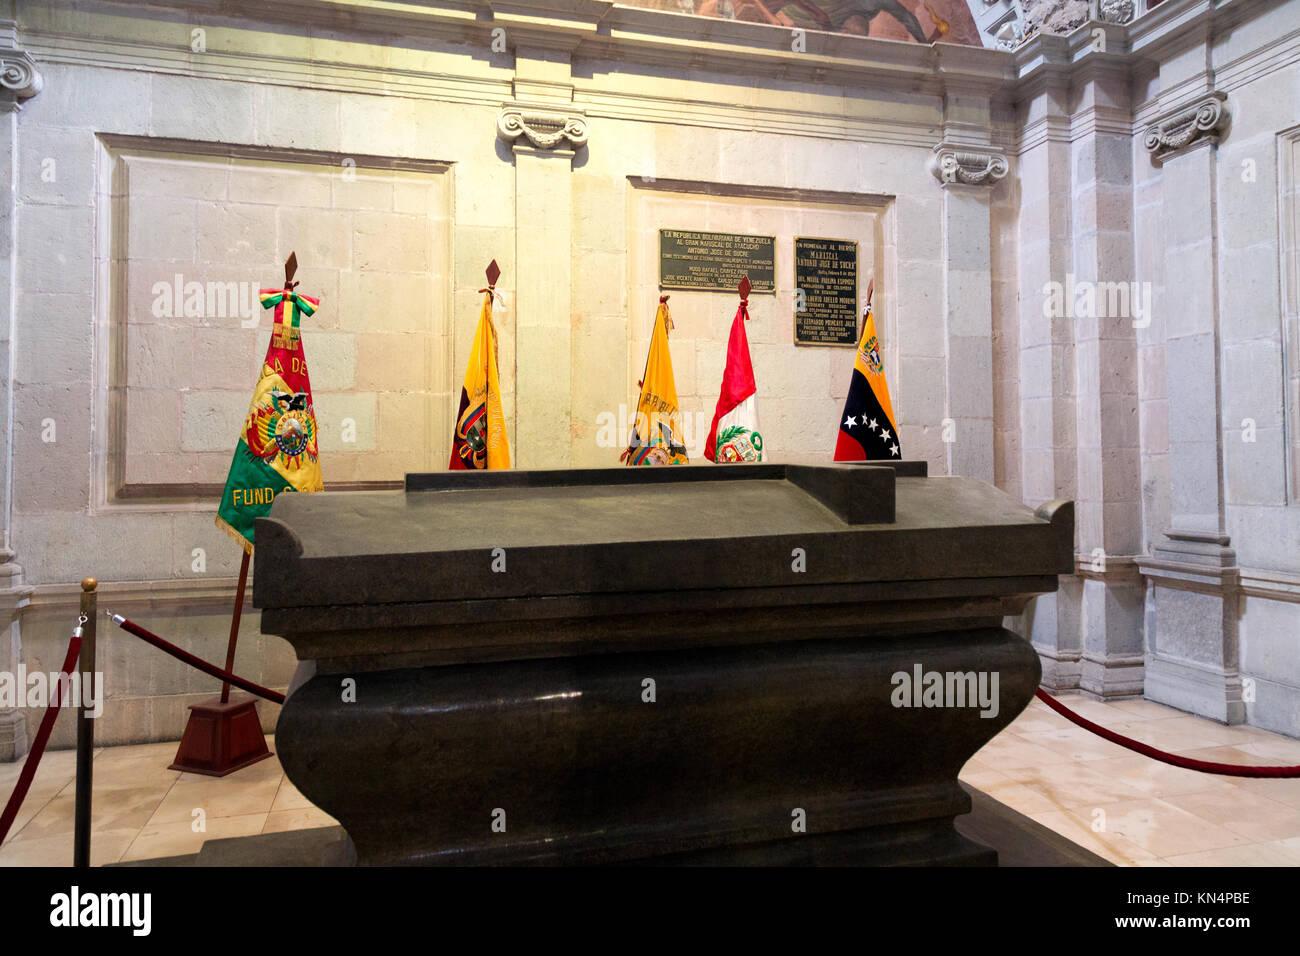 The tomb of Antonio José de Sucre, former president of both Venezuela and Peru; in Quito Cathedral, Quito Ecuador - Stock Image